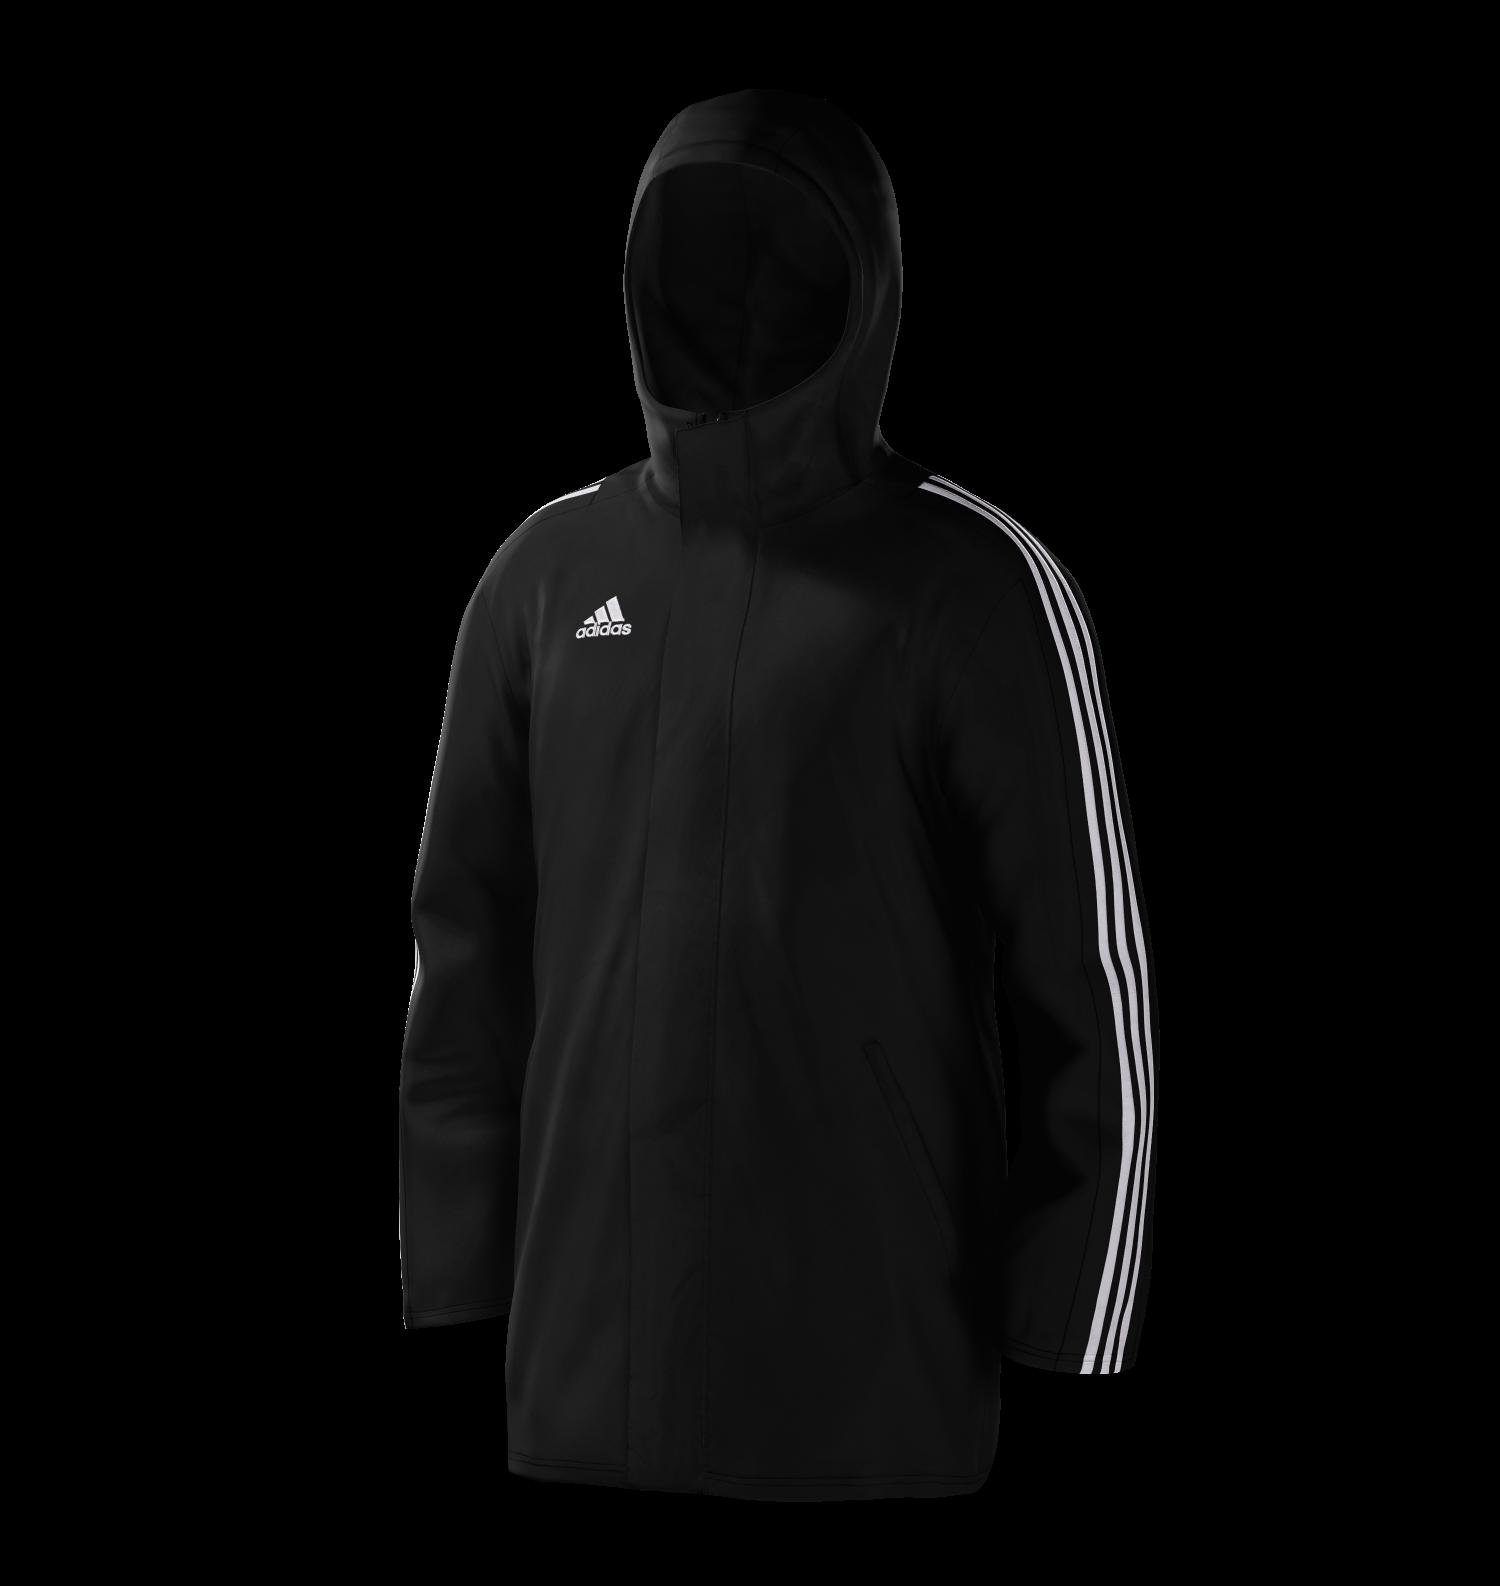 Kirkby Lonsdale Hockey Club Black Adidas Stadium Jacket